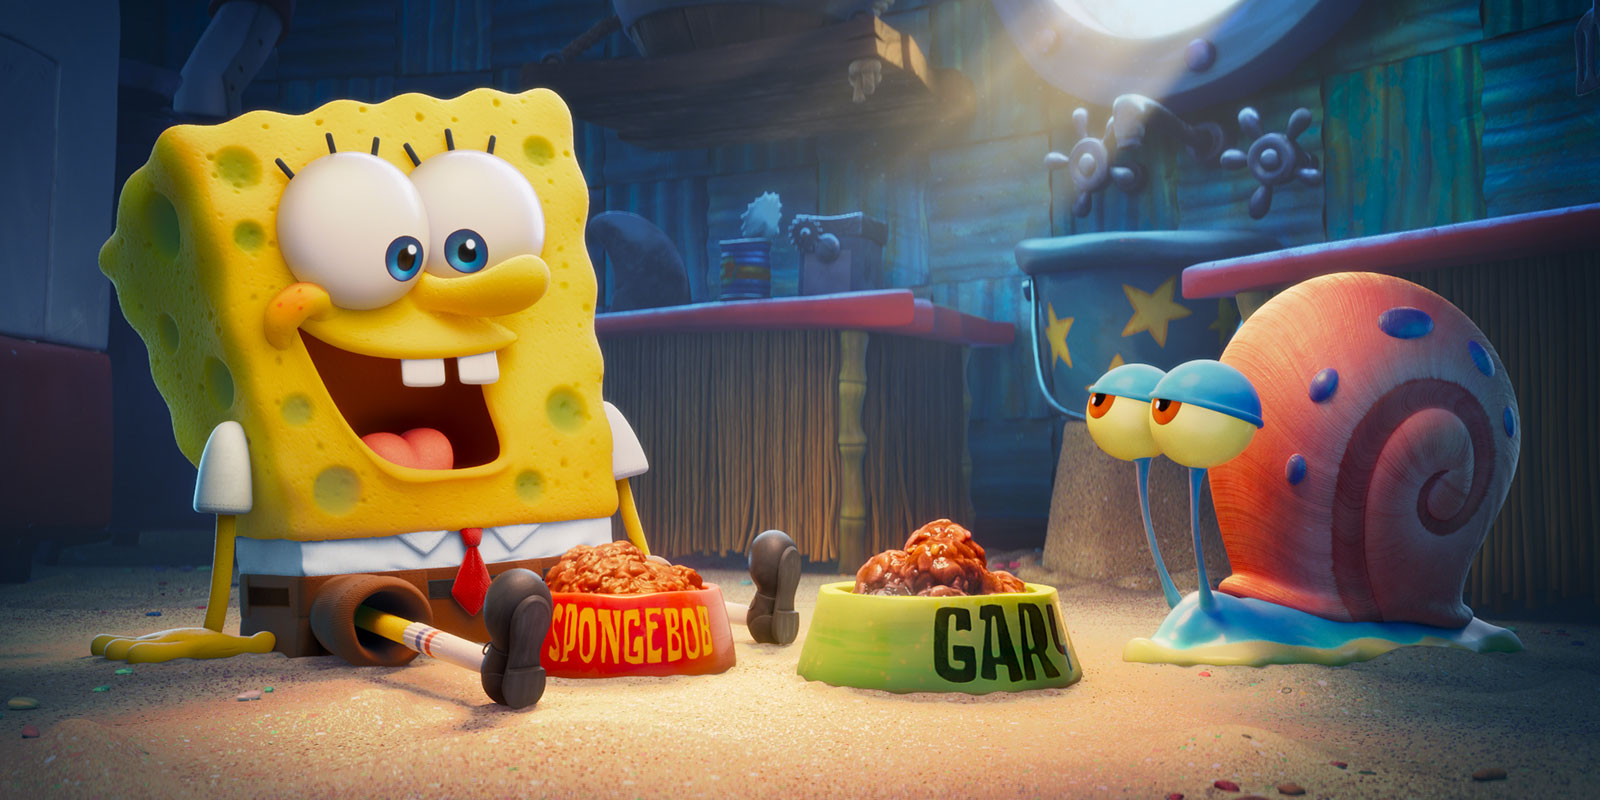 The SpongeBob Movie Sponge On The Run Nickelodeon Movies Paramount Animation Pictures Nick SBSP 1